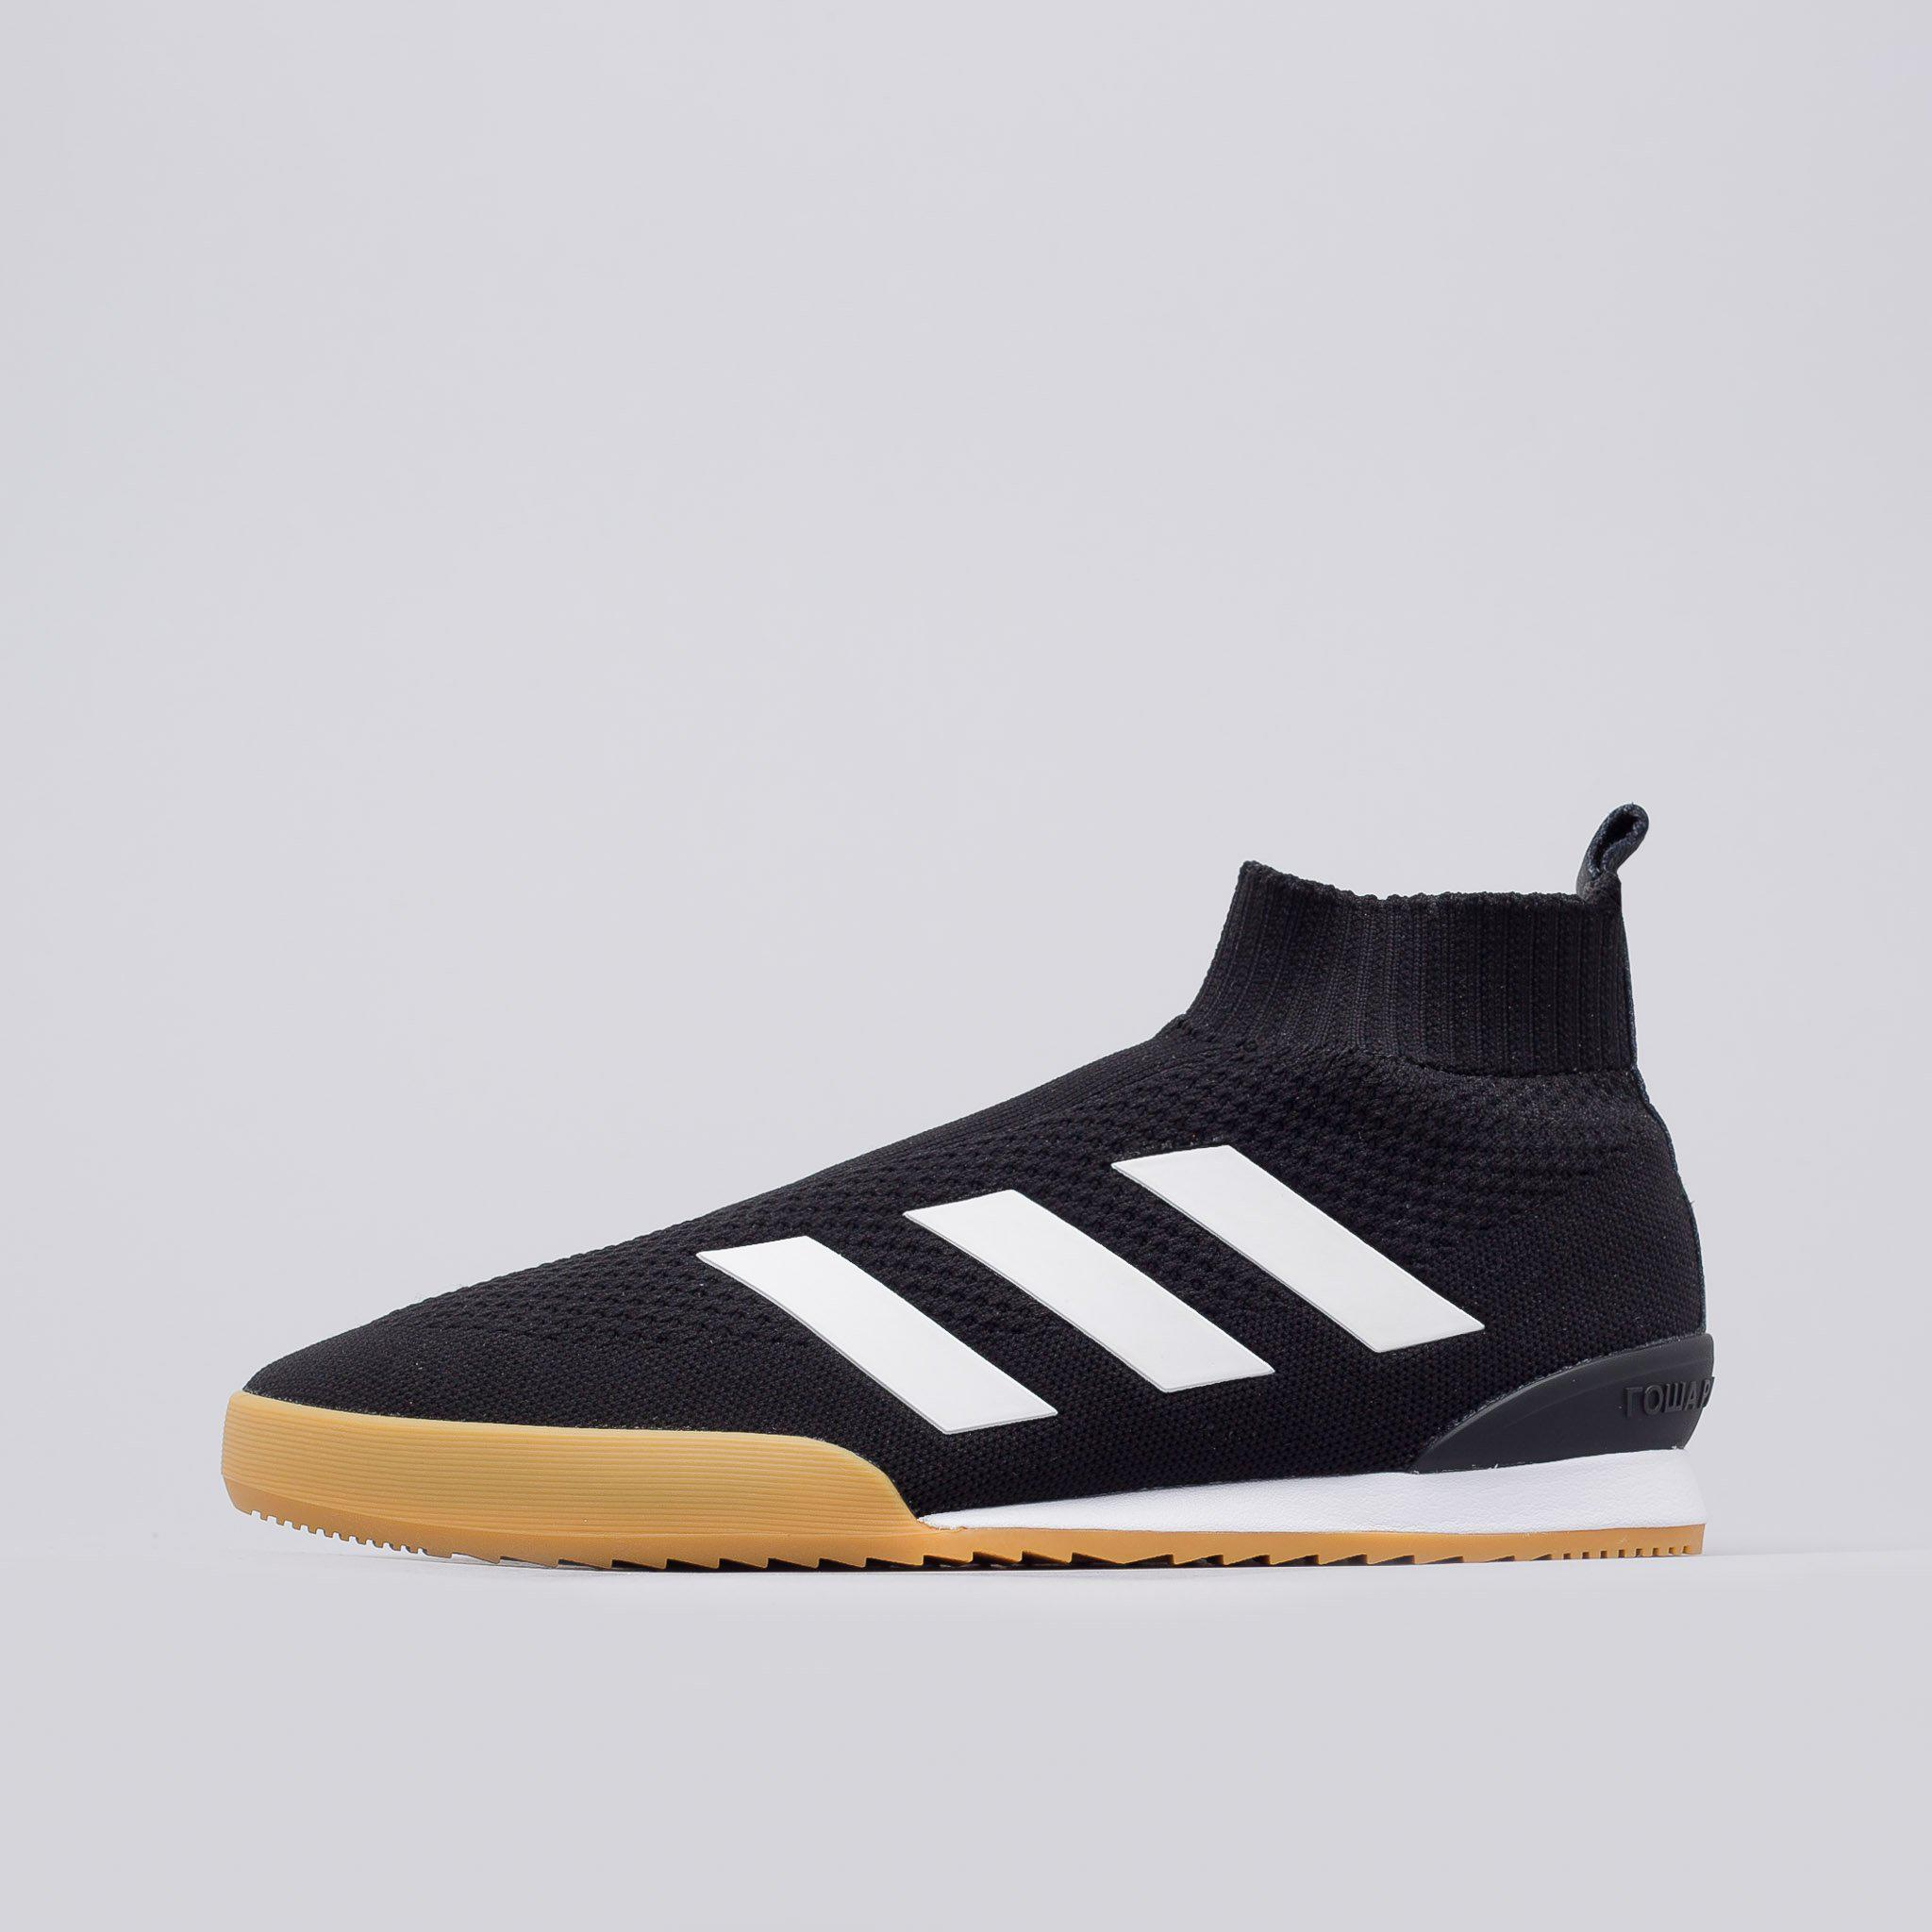 Lyst Gosha rubchinskiy x Adidas ACE super zapatos en negro en negro